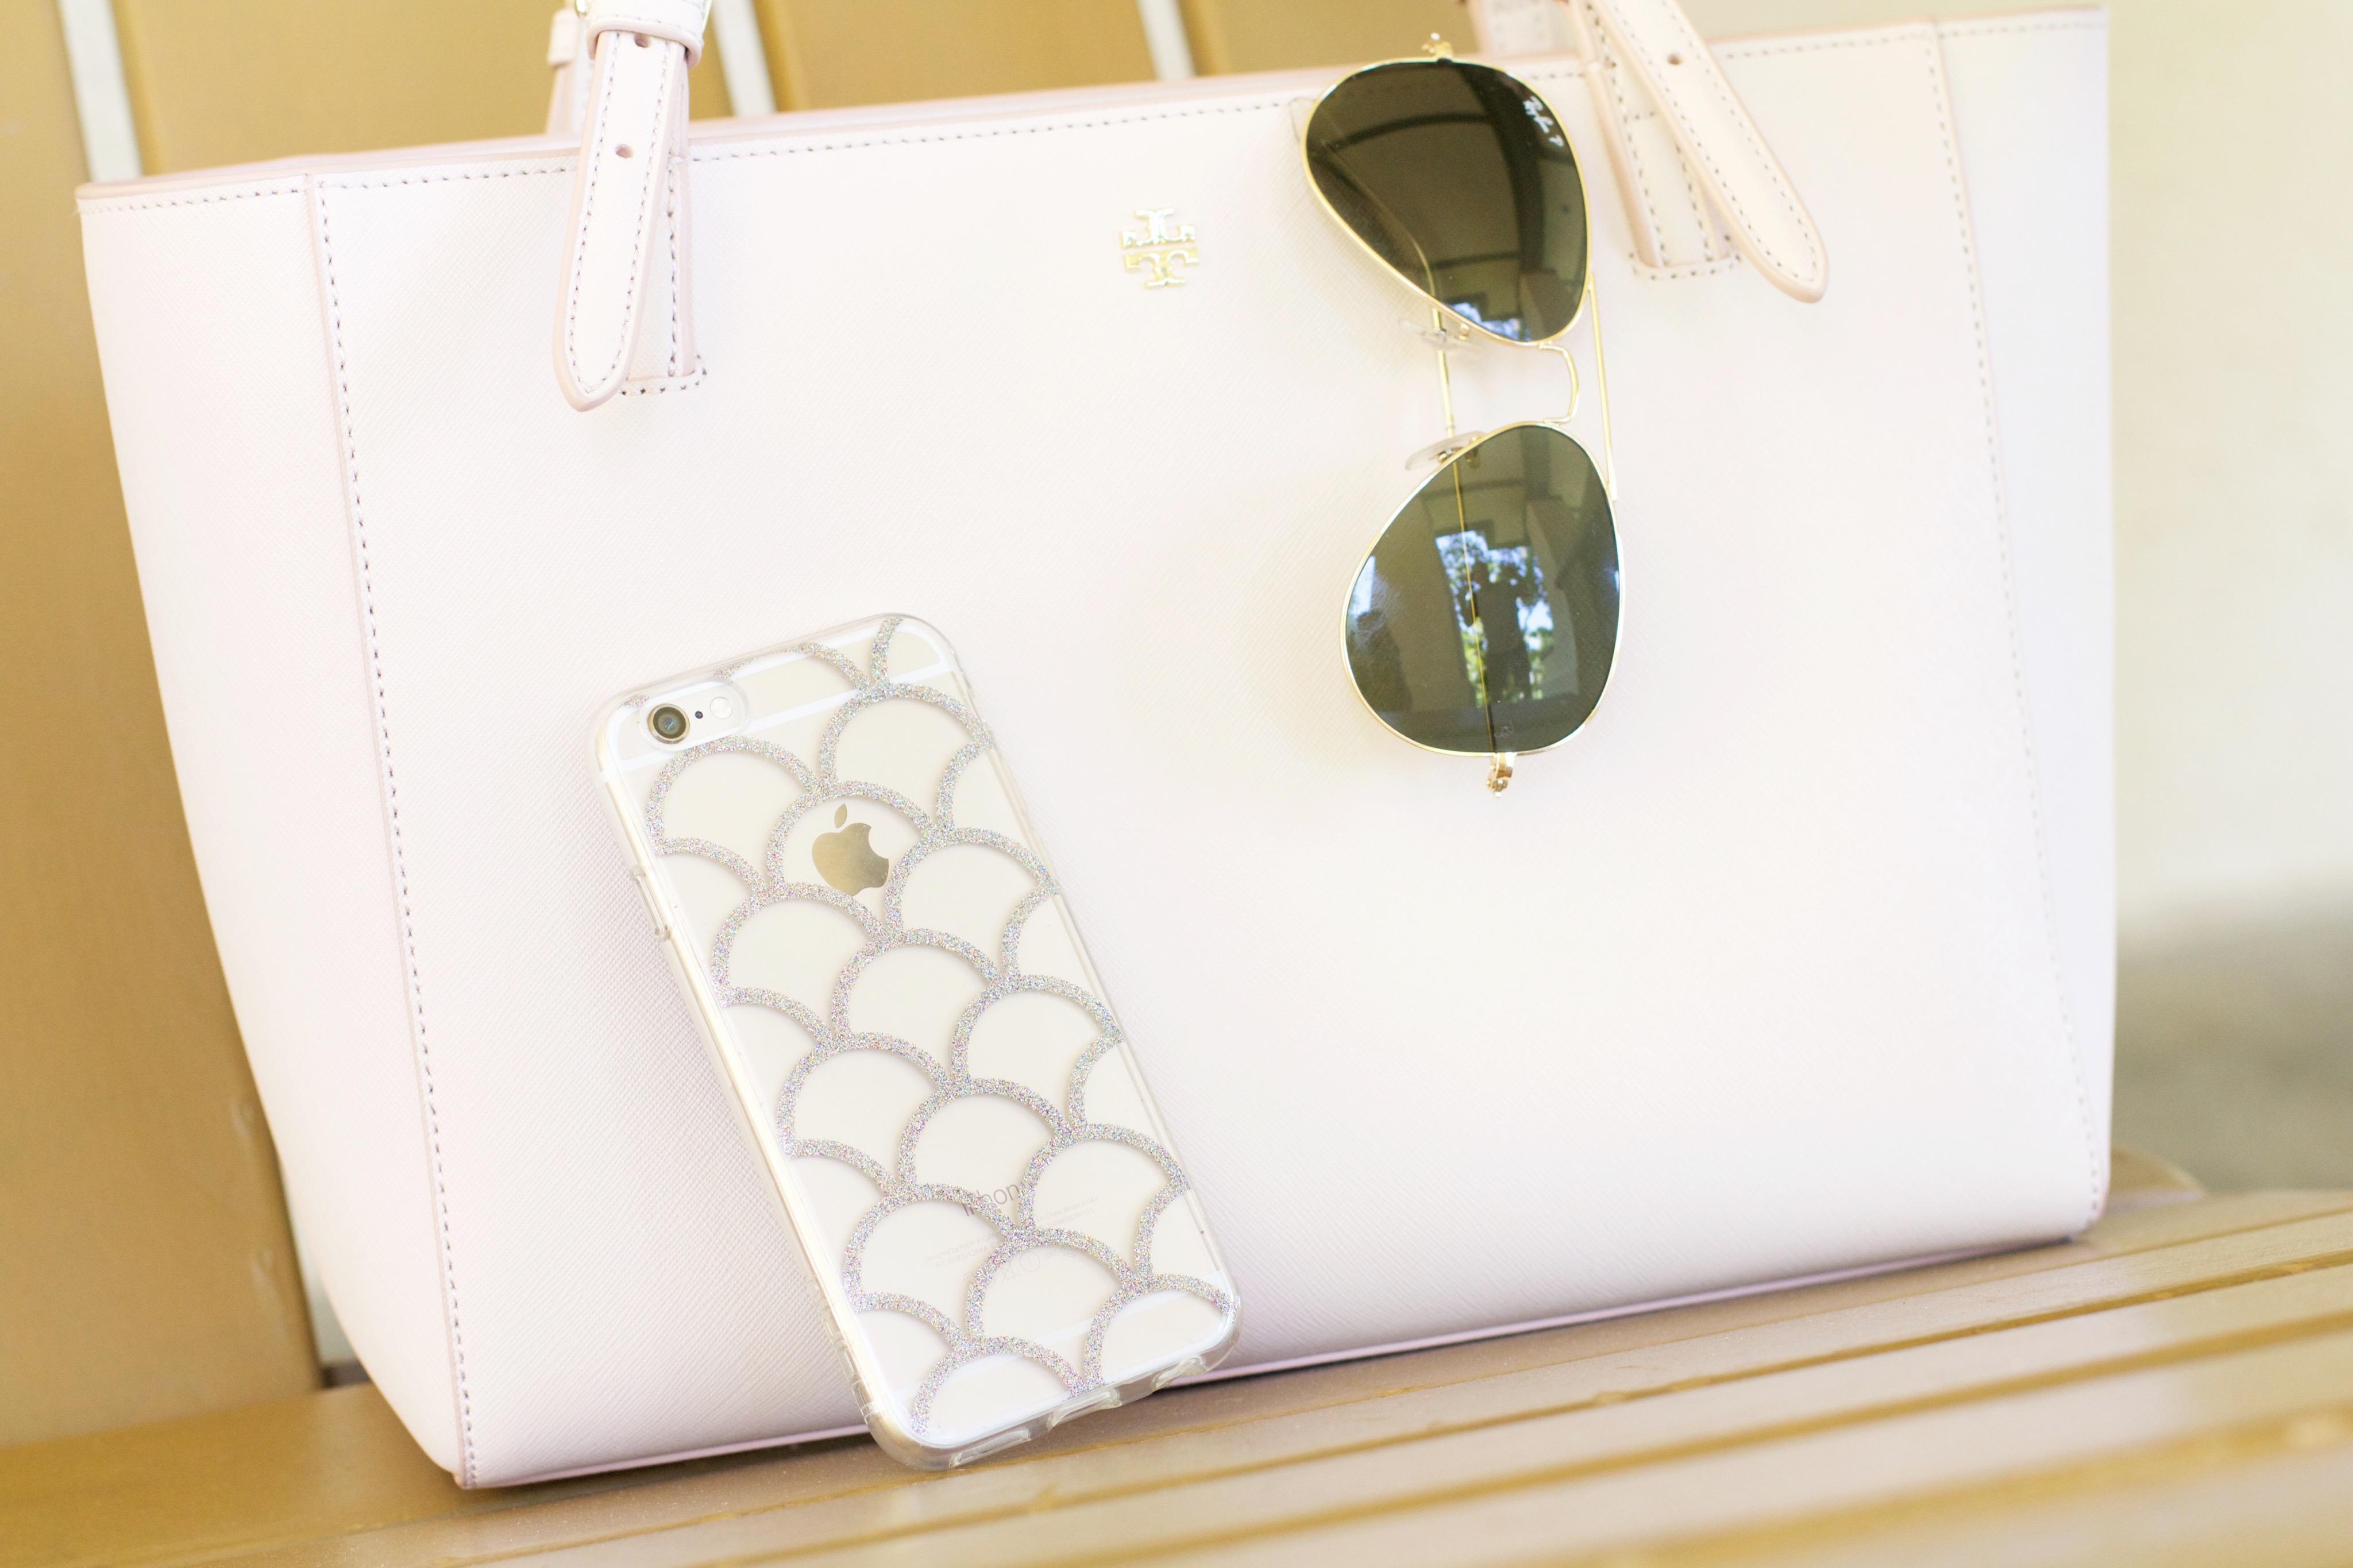 a962bb93311c Incipio Mermaid iPhone case - my styled life